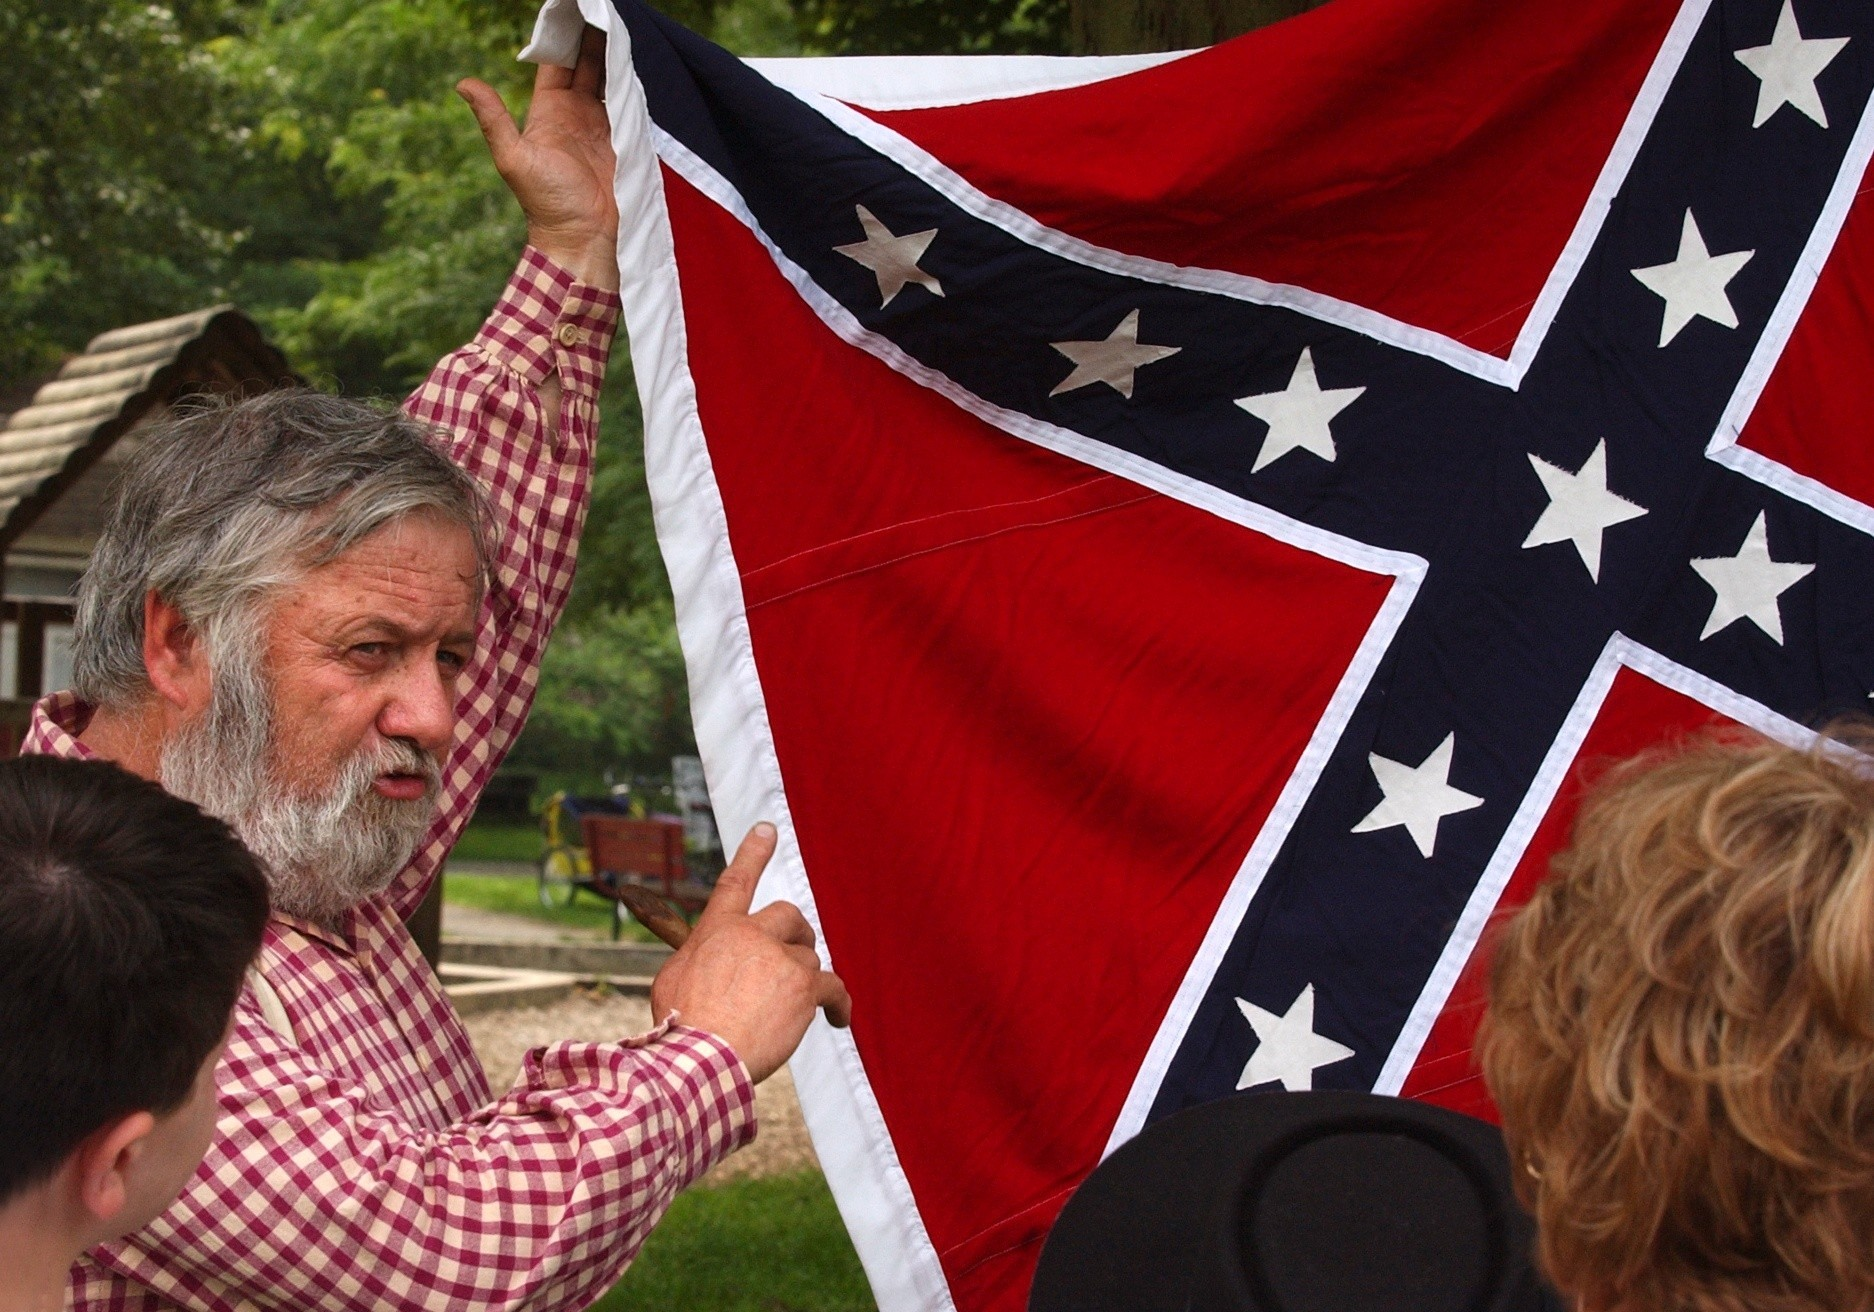 Black Book Car >> Gettysburg book store removes Confederate flag merchandise ...